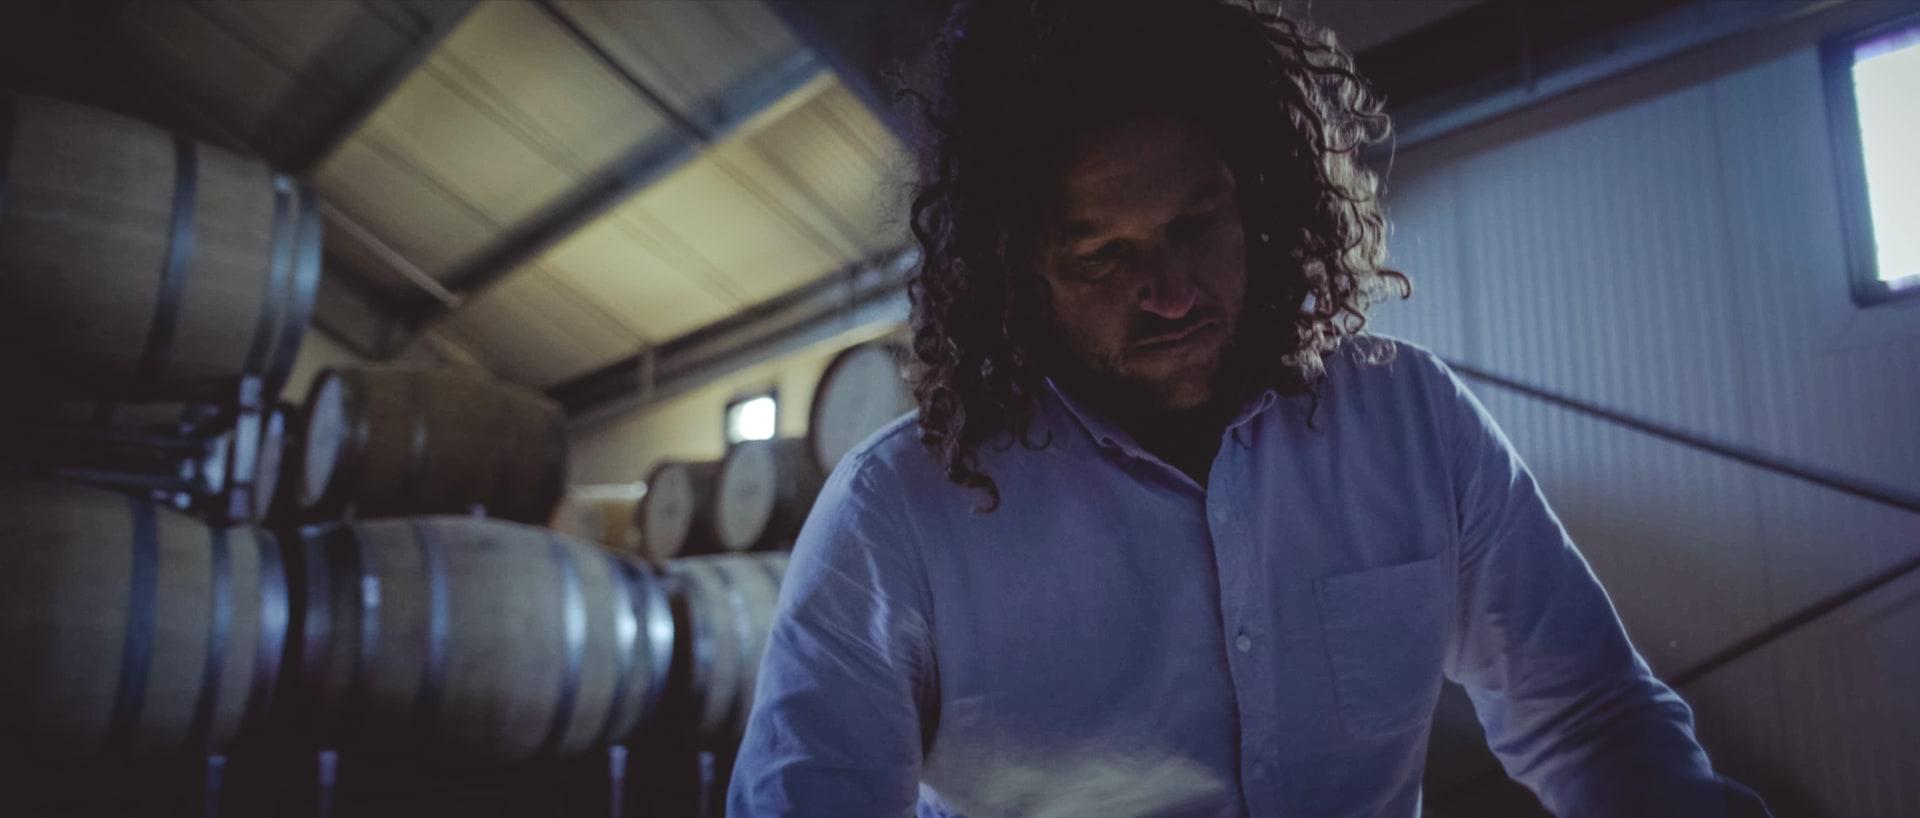 LOLA WINES - Winemaker Portrait